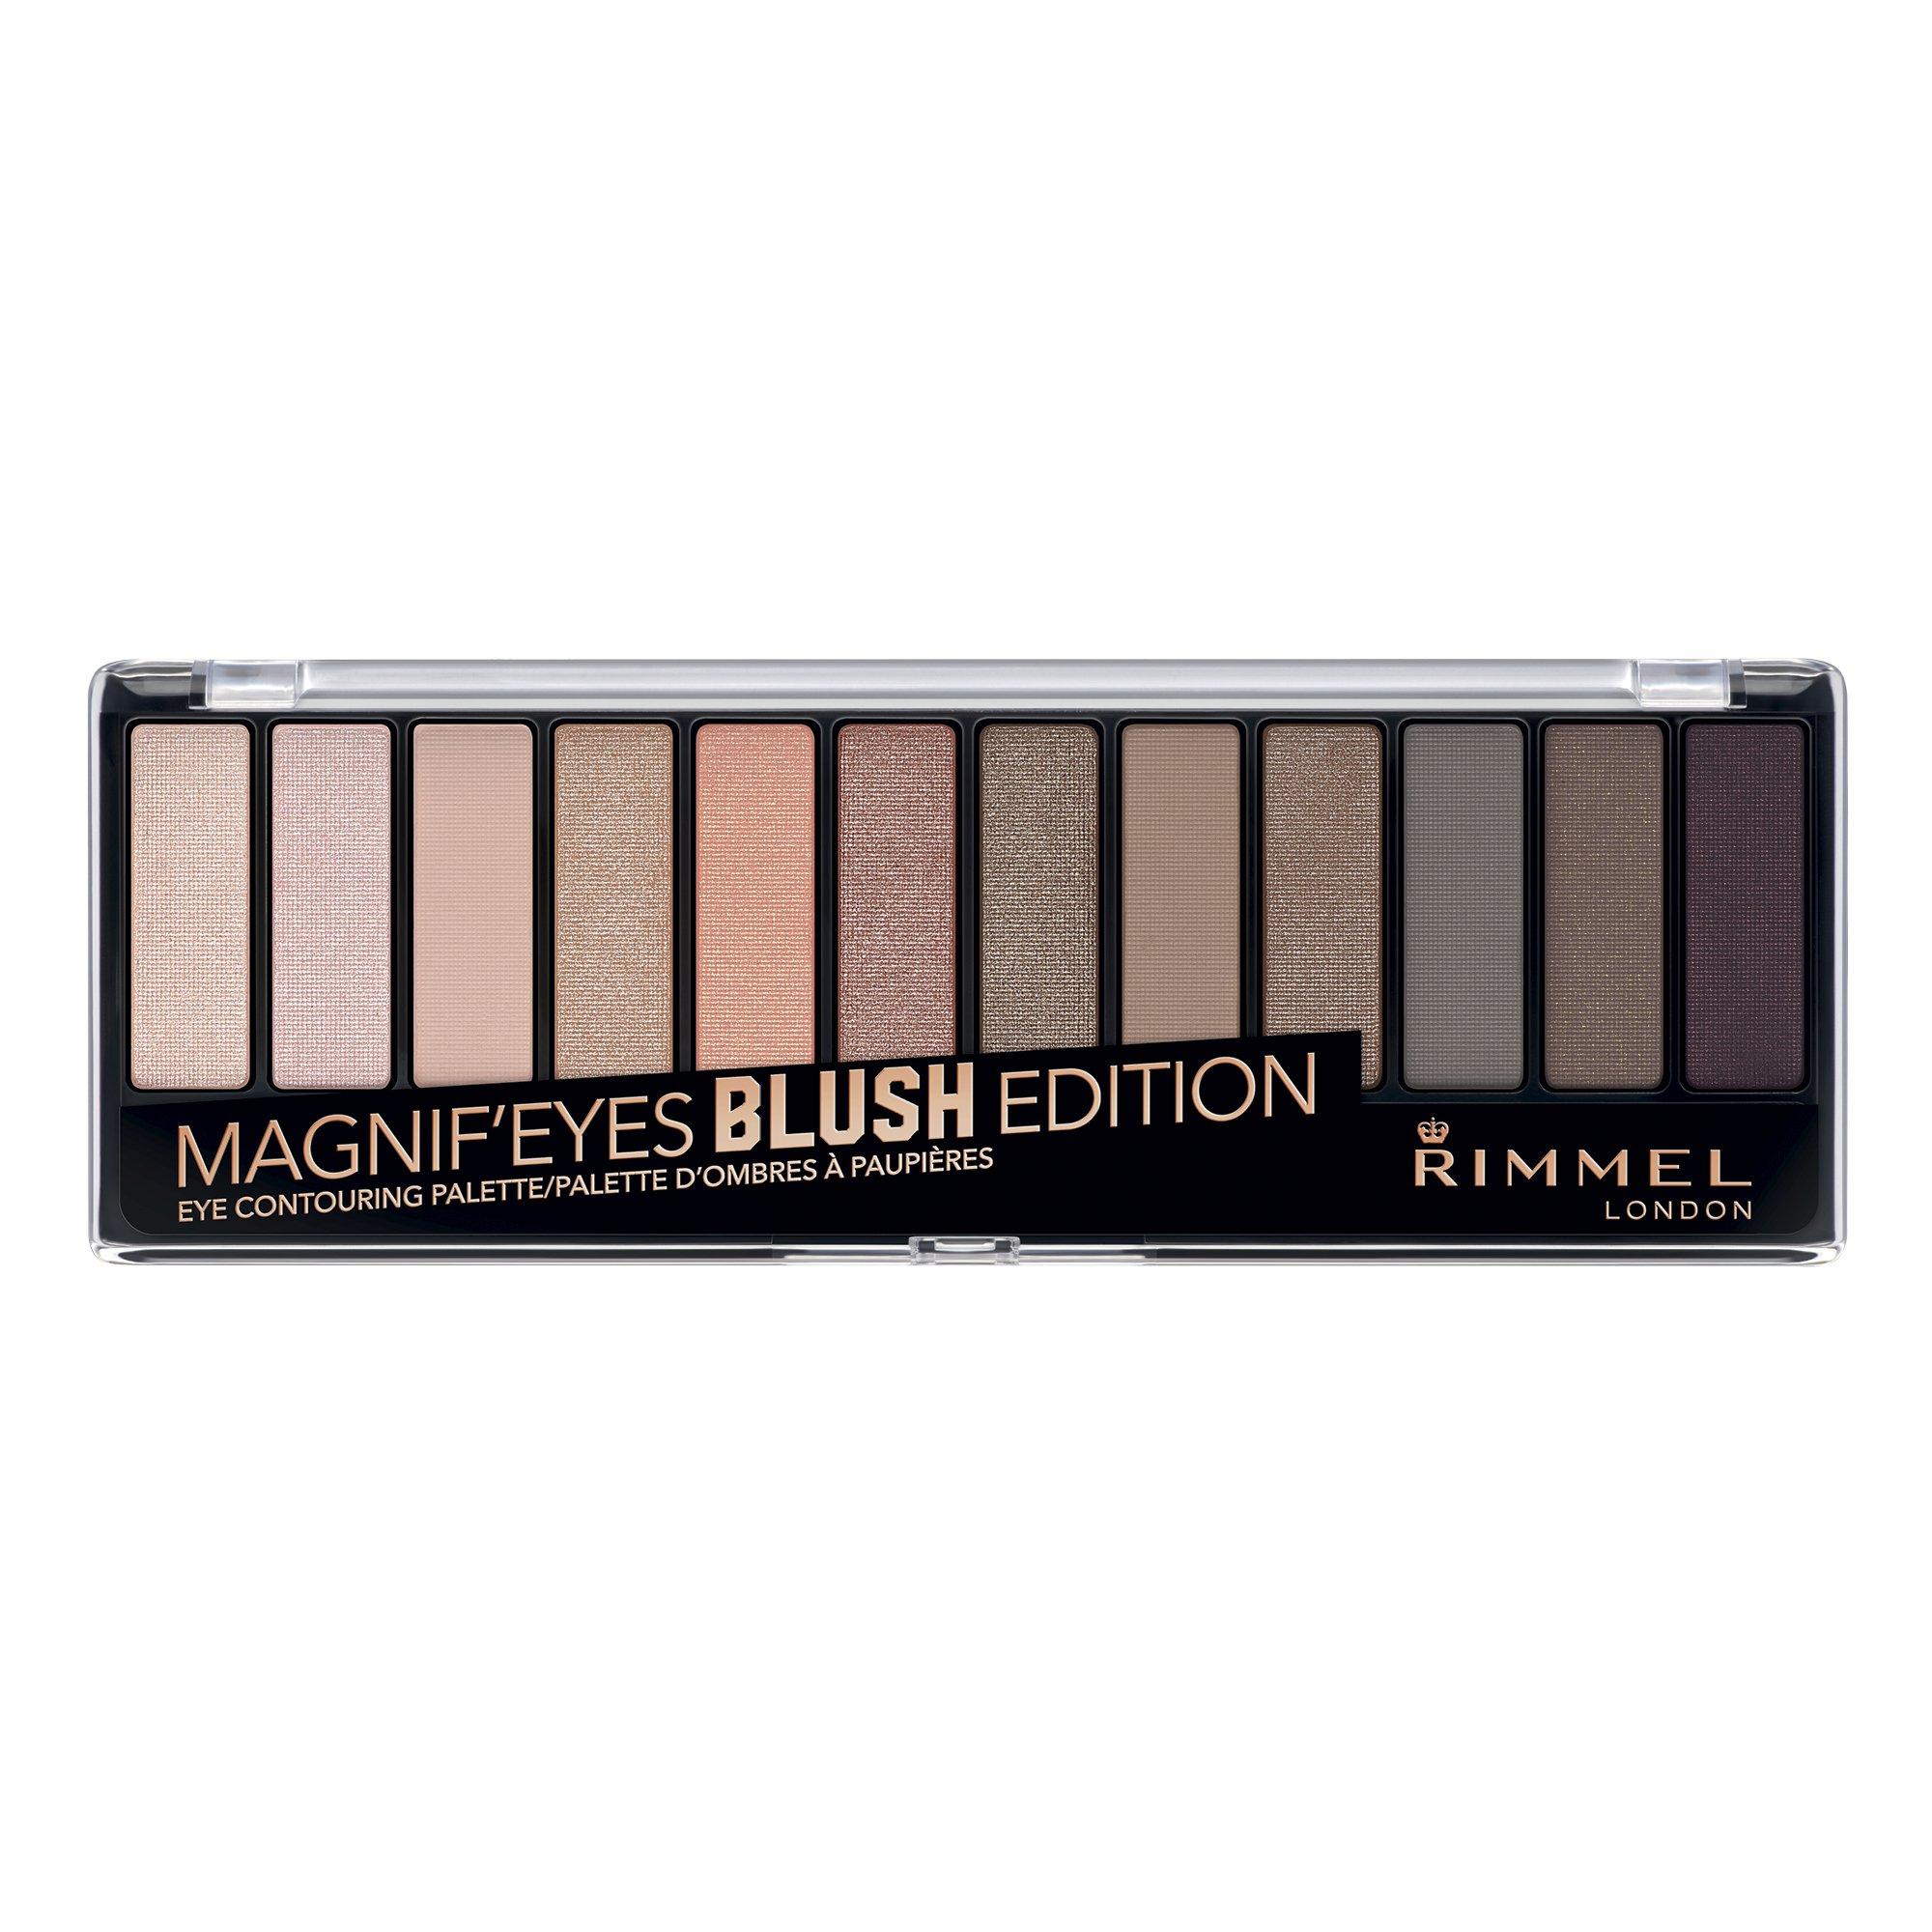 Rimmel Magnif'eyes Eye Palette, London Nudes Calling, 0.5 oz, 12 Shades of High Shimmer, Blendable, Crease & Smudge Resistant Eyeshadow